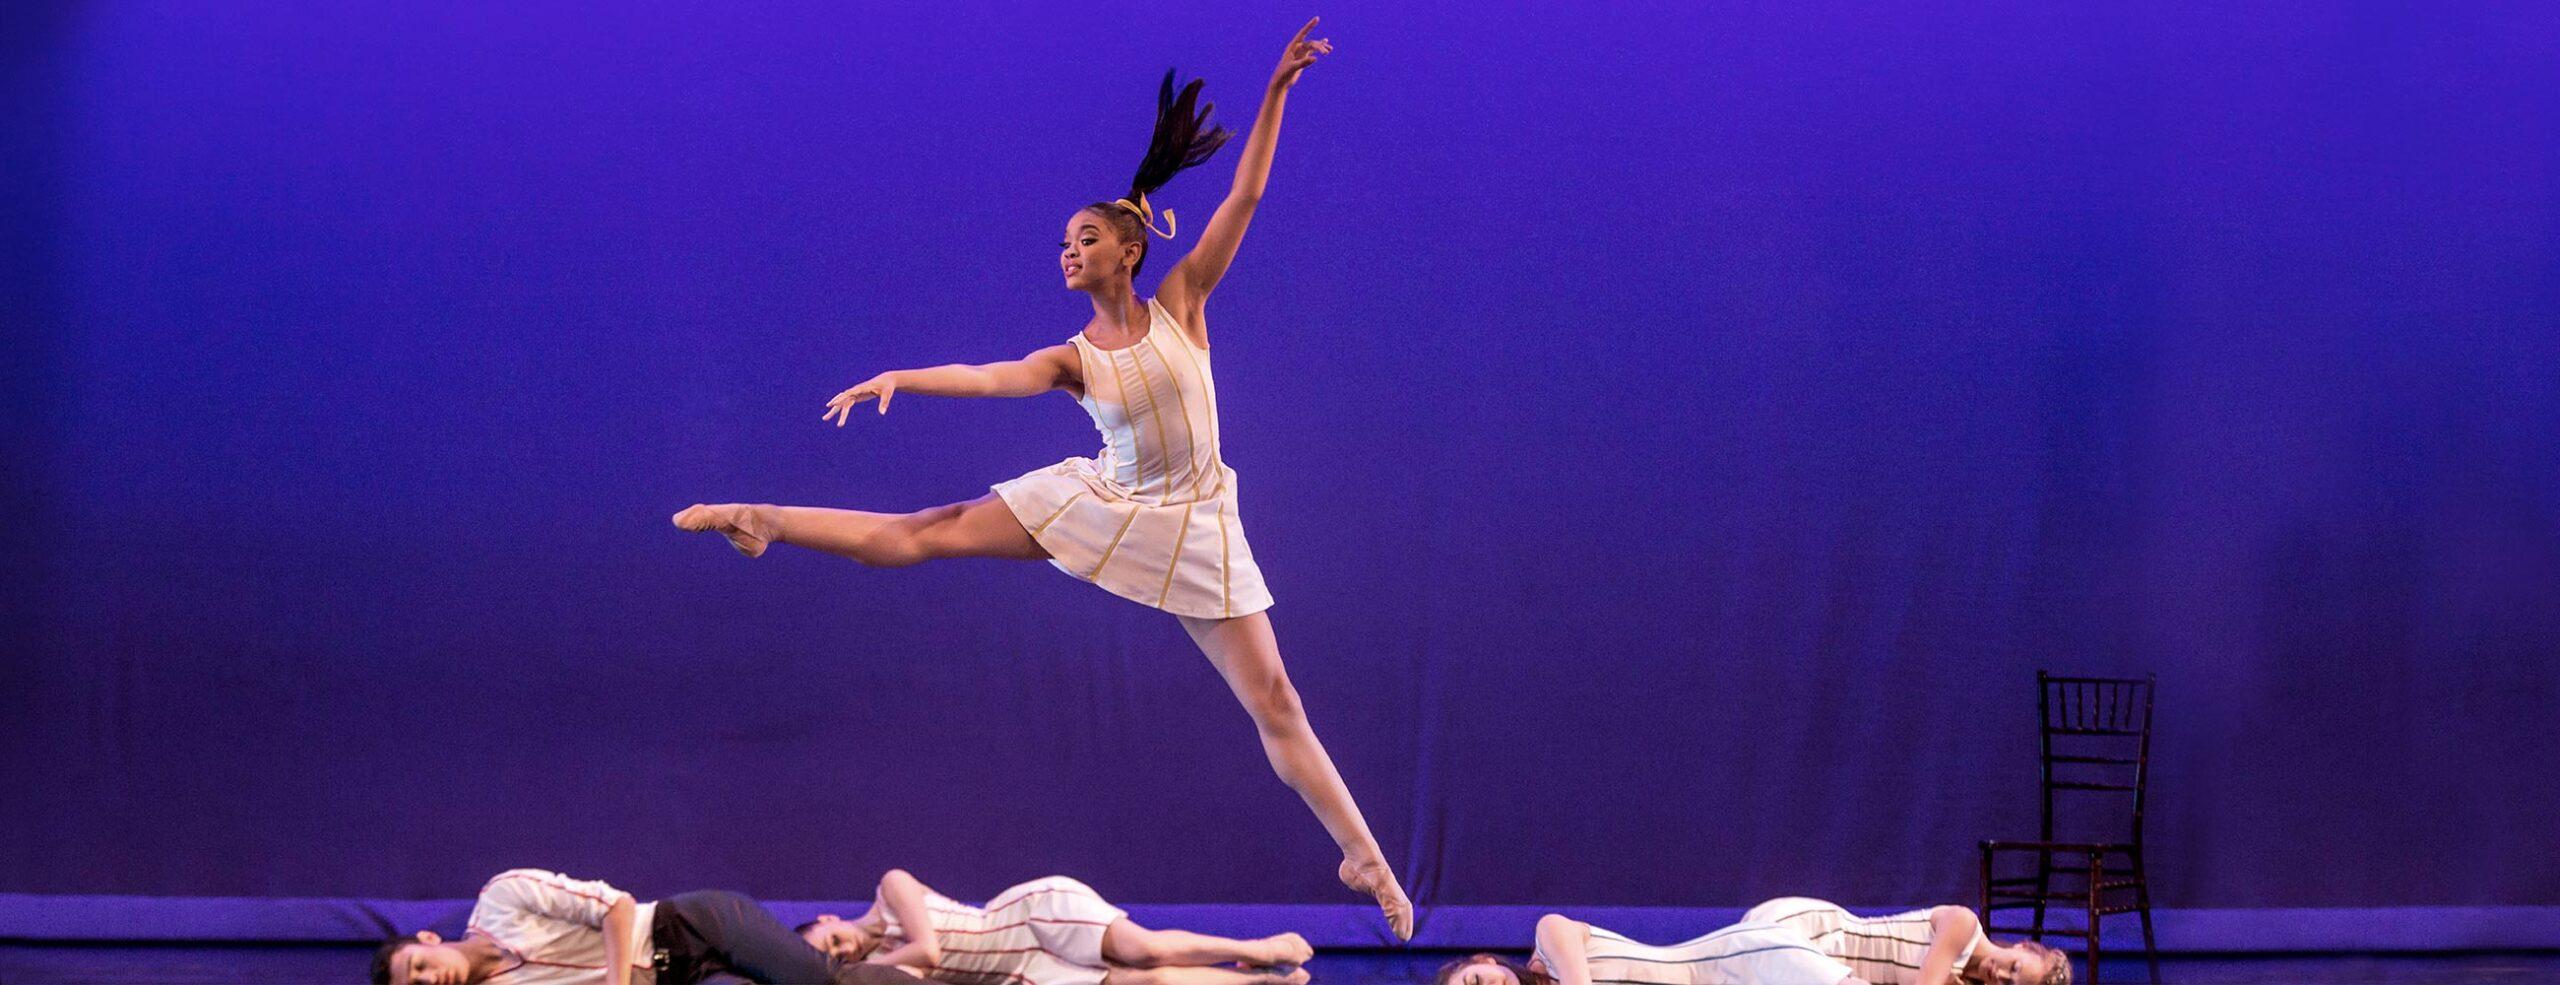 Ballet dancer jumping on stage